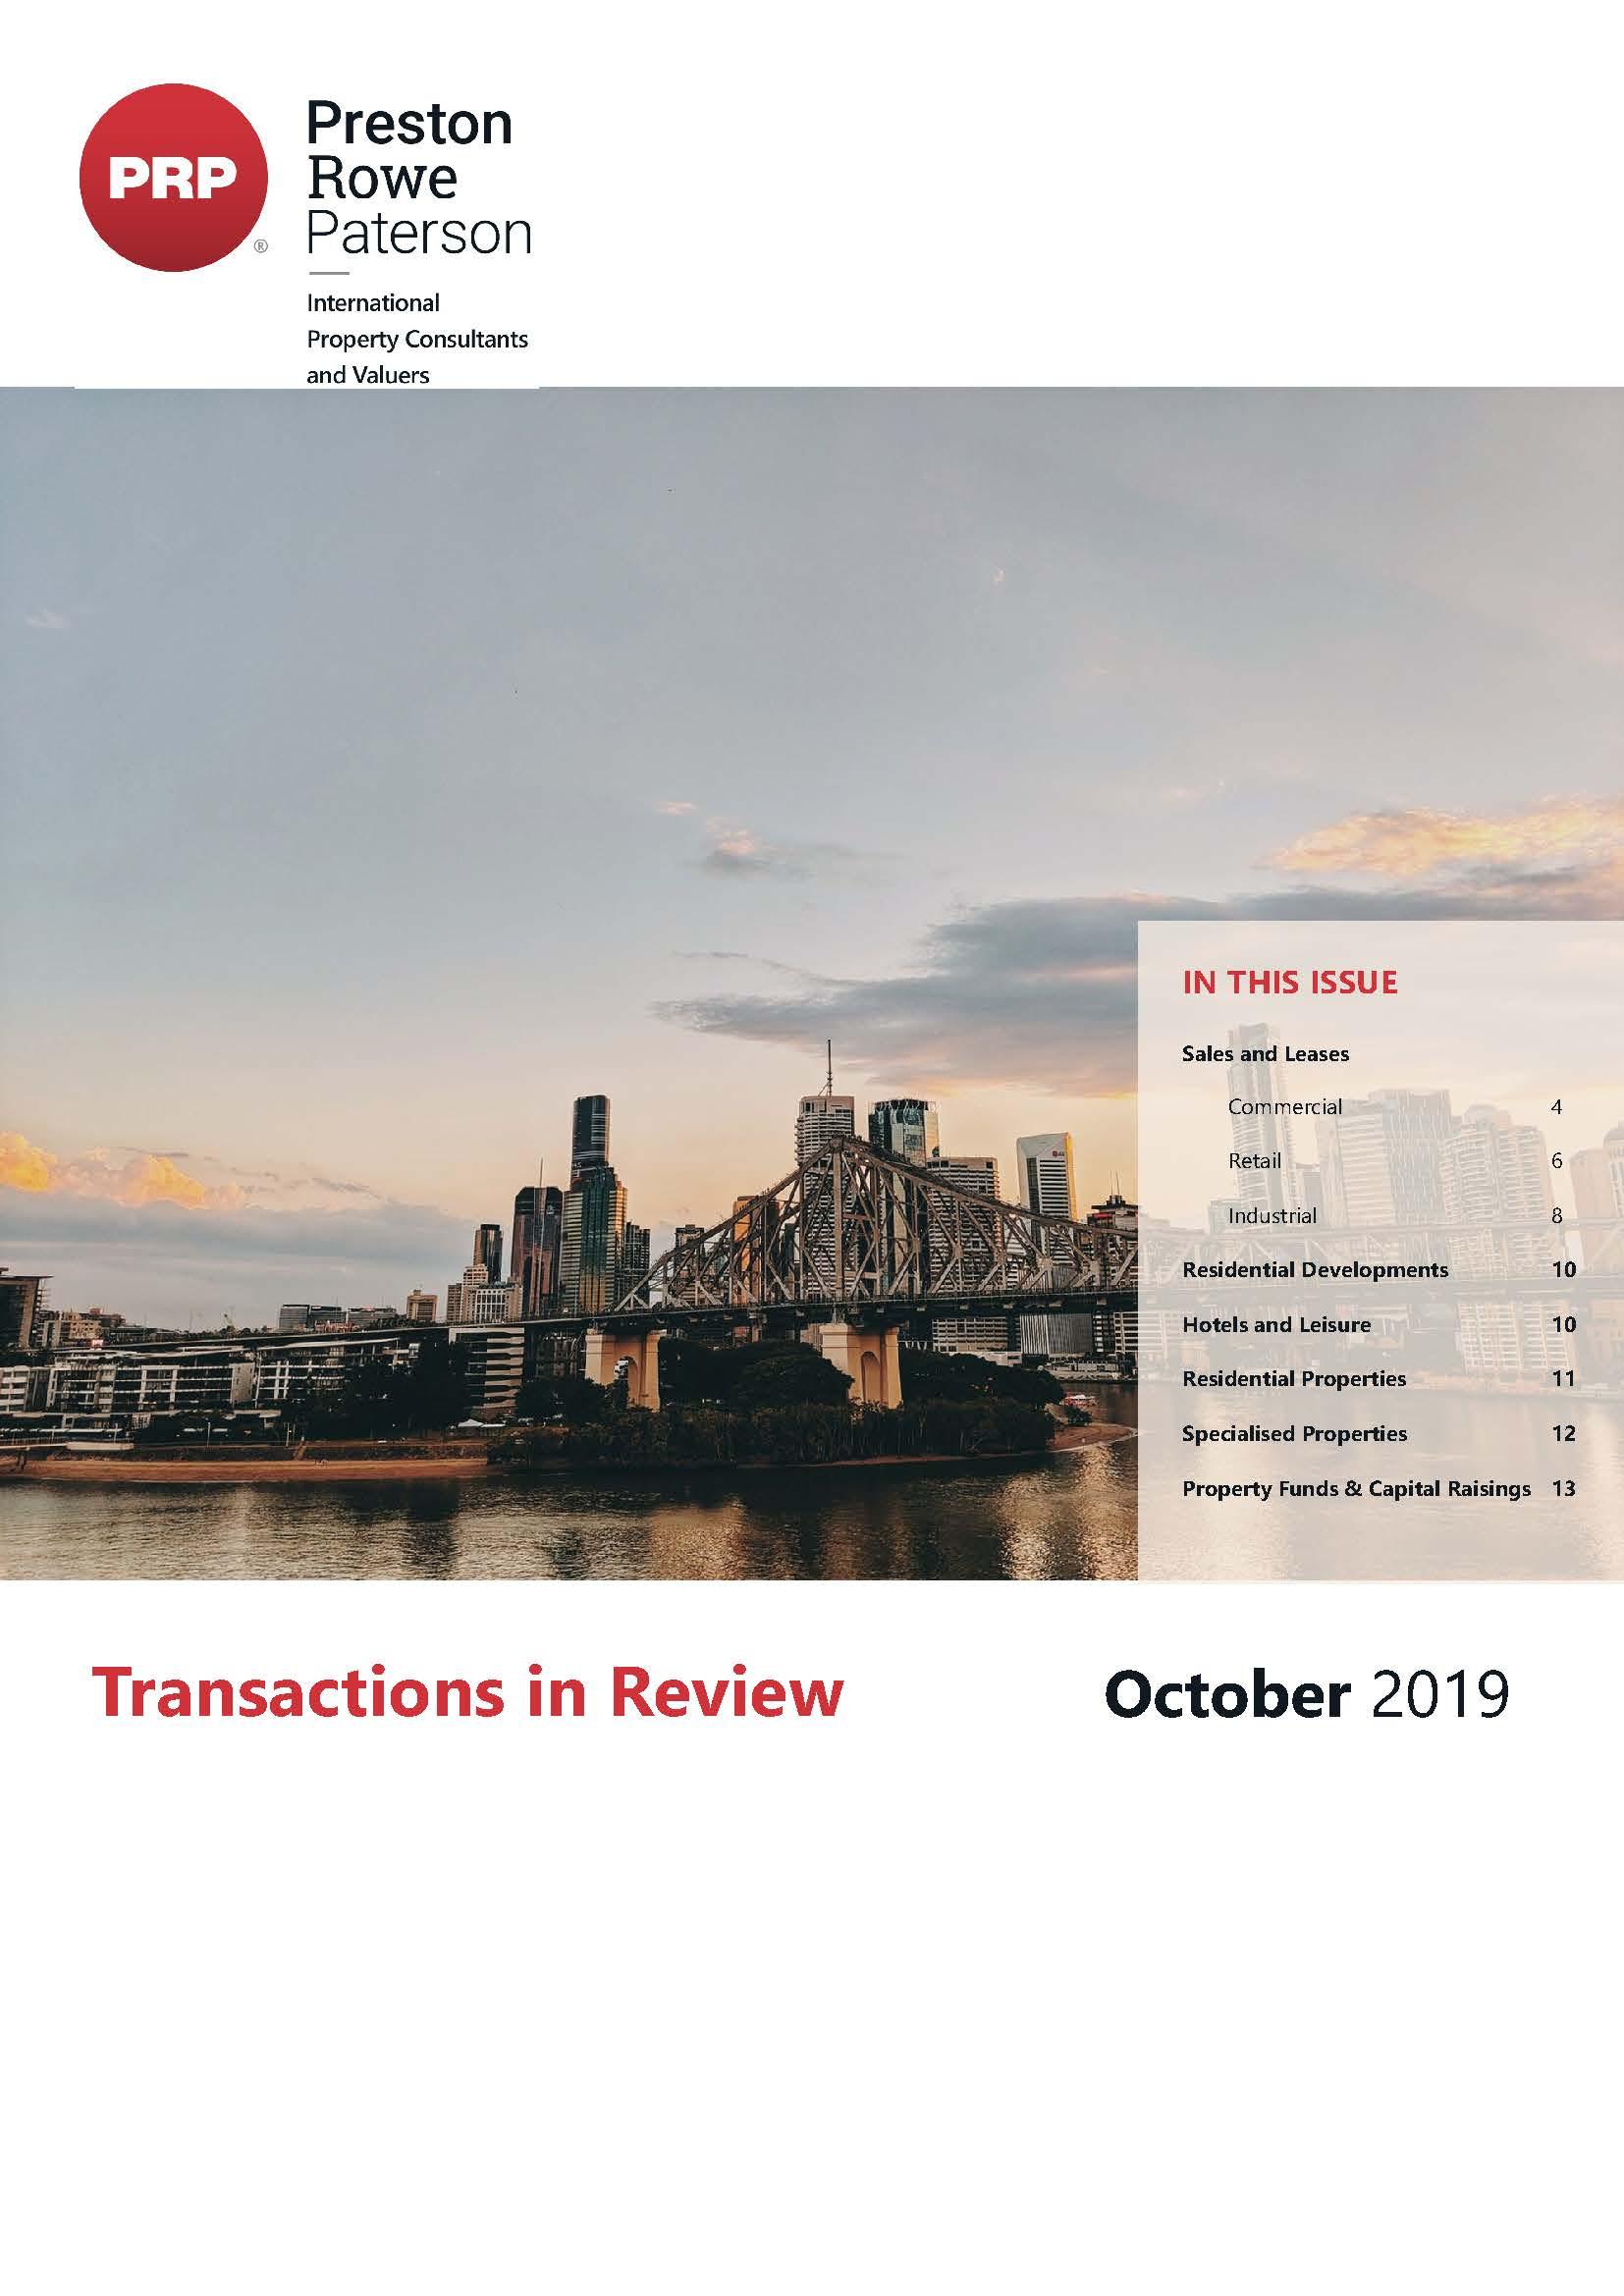 TIR October 2019